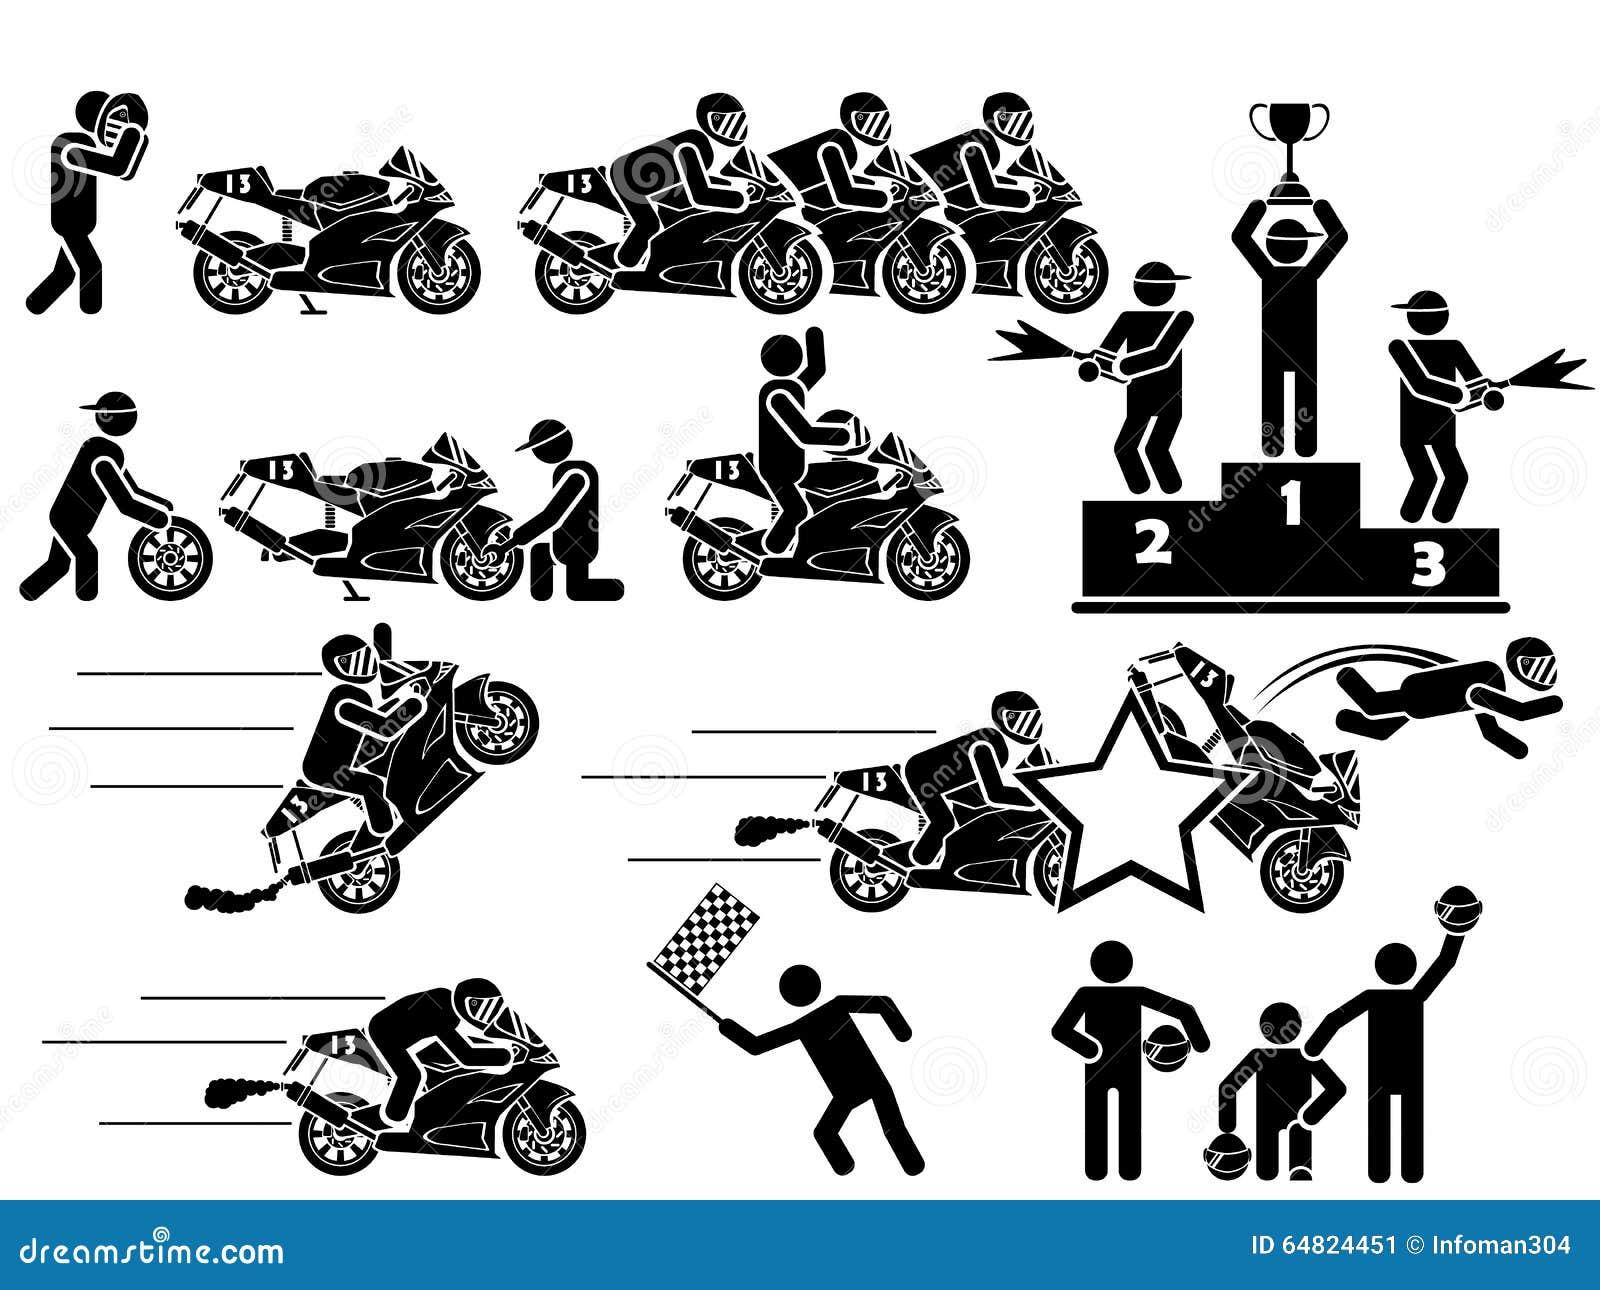 monza cartoons  illustrations  u0026 vector stock images